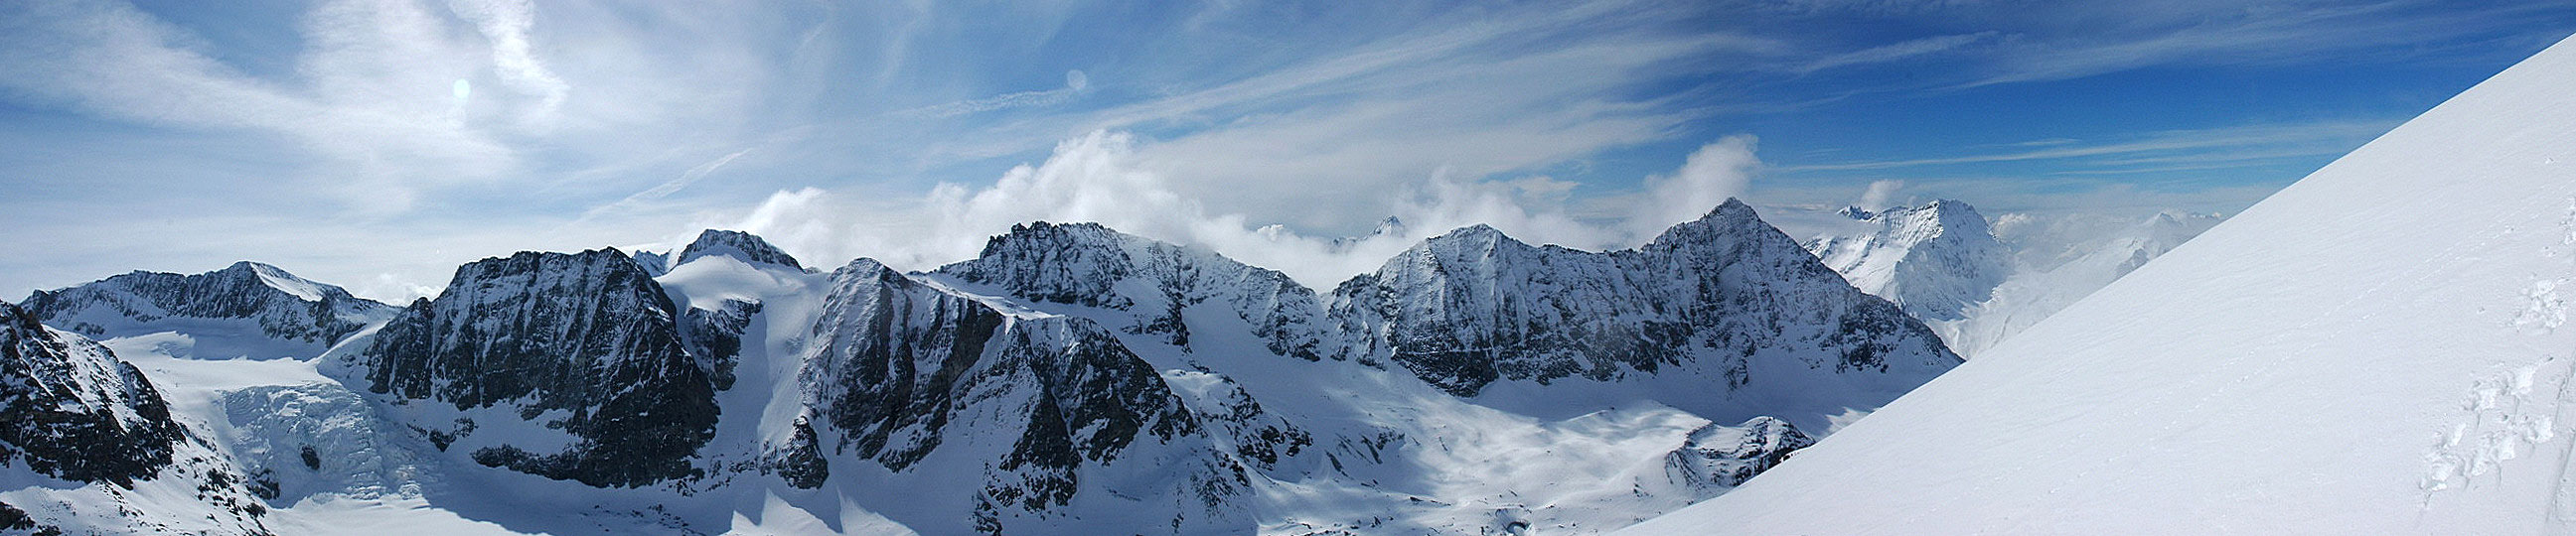 La Ruinette Walliser Alpen / Alpes valaisannes Schweiz panorama 34